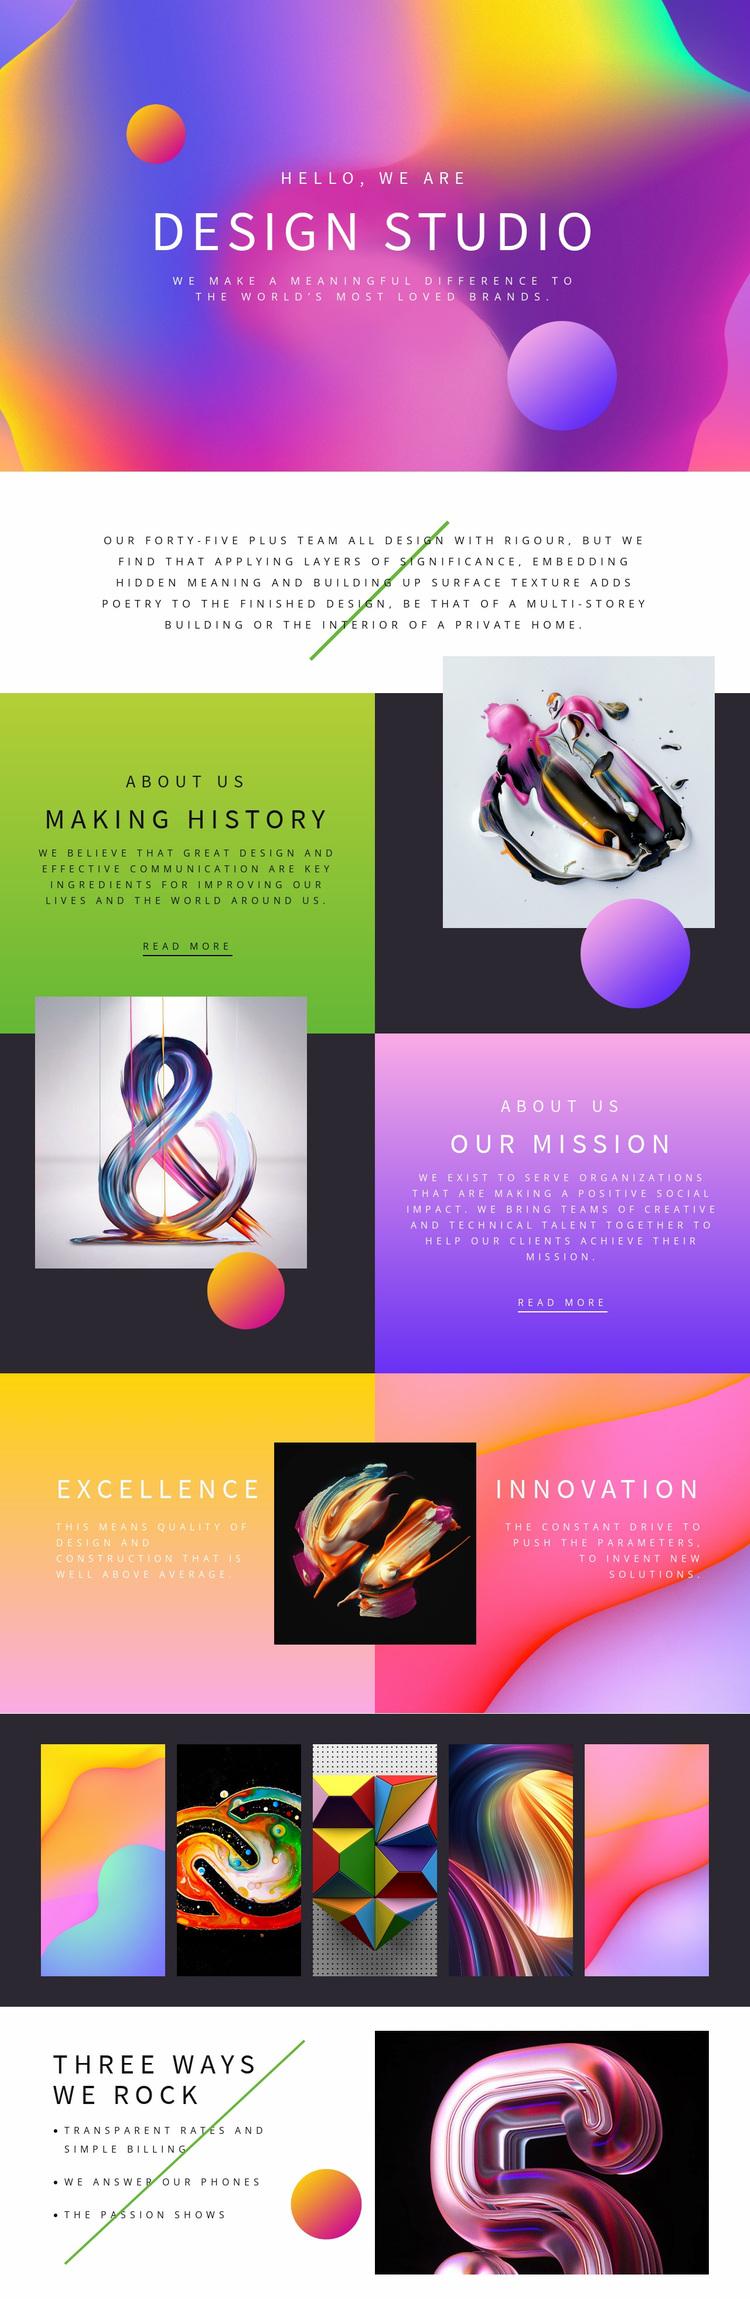 Progressive design art Website Design